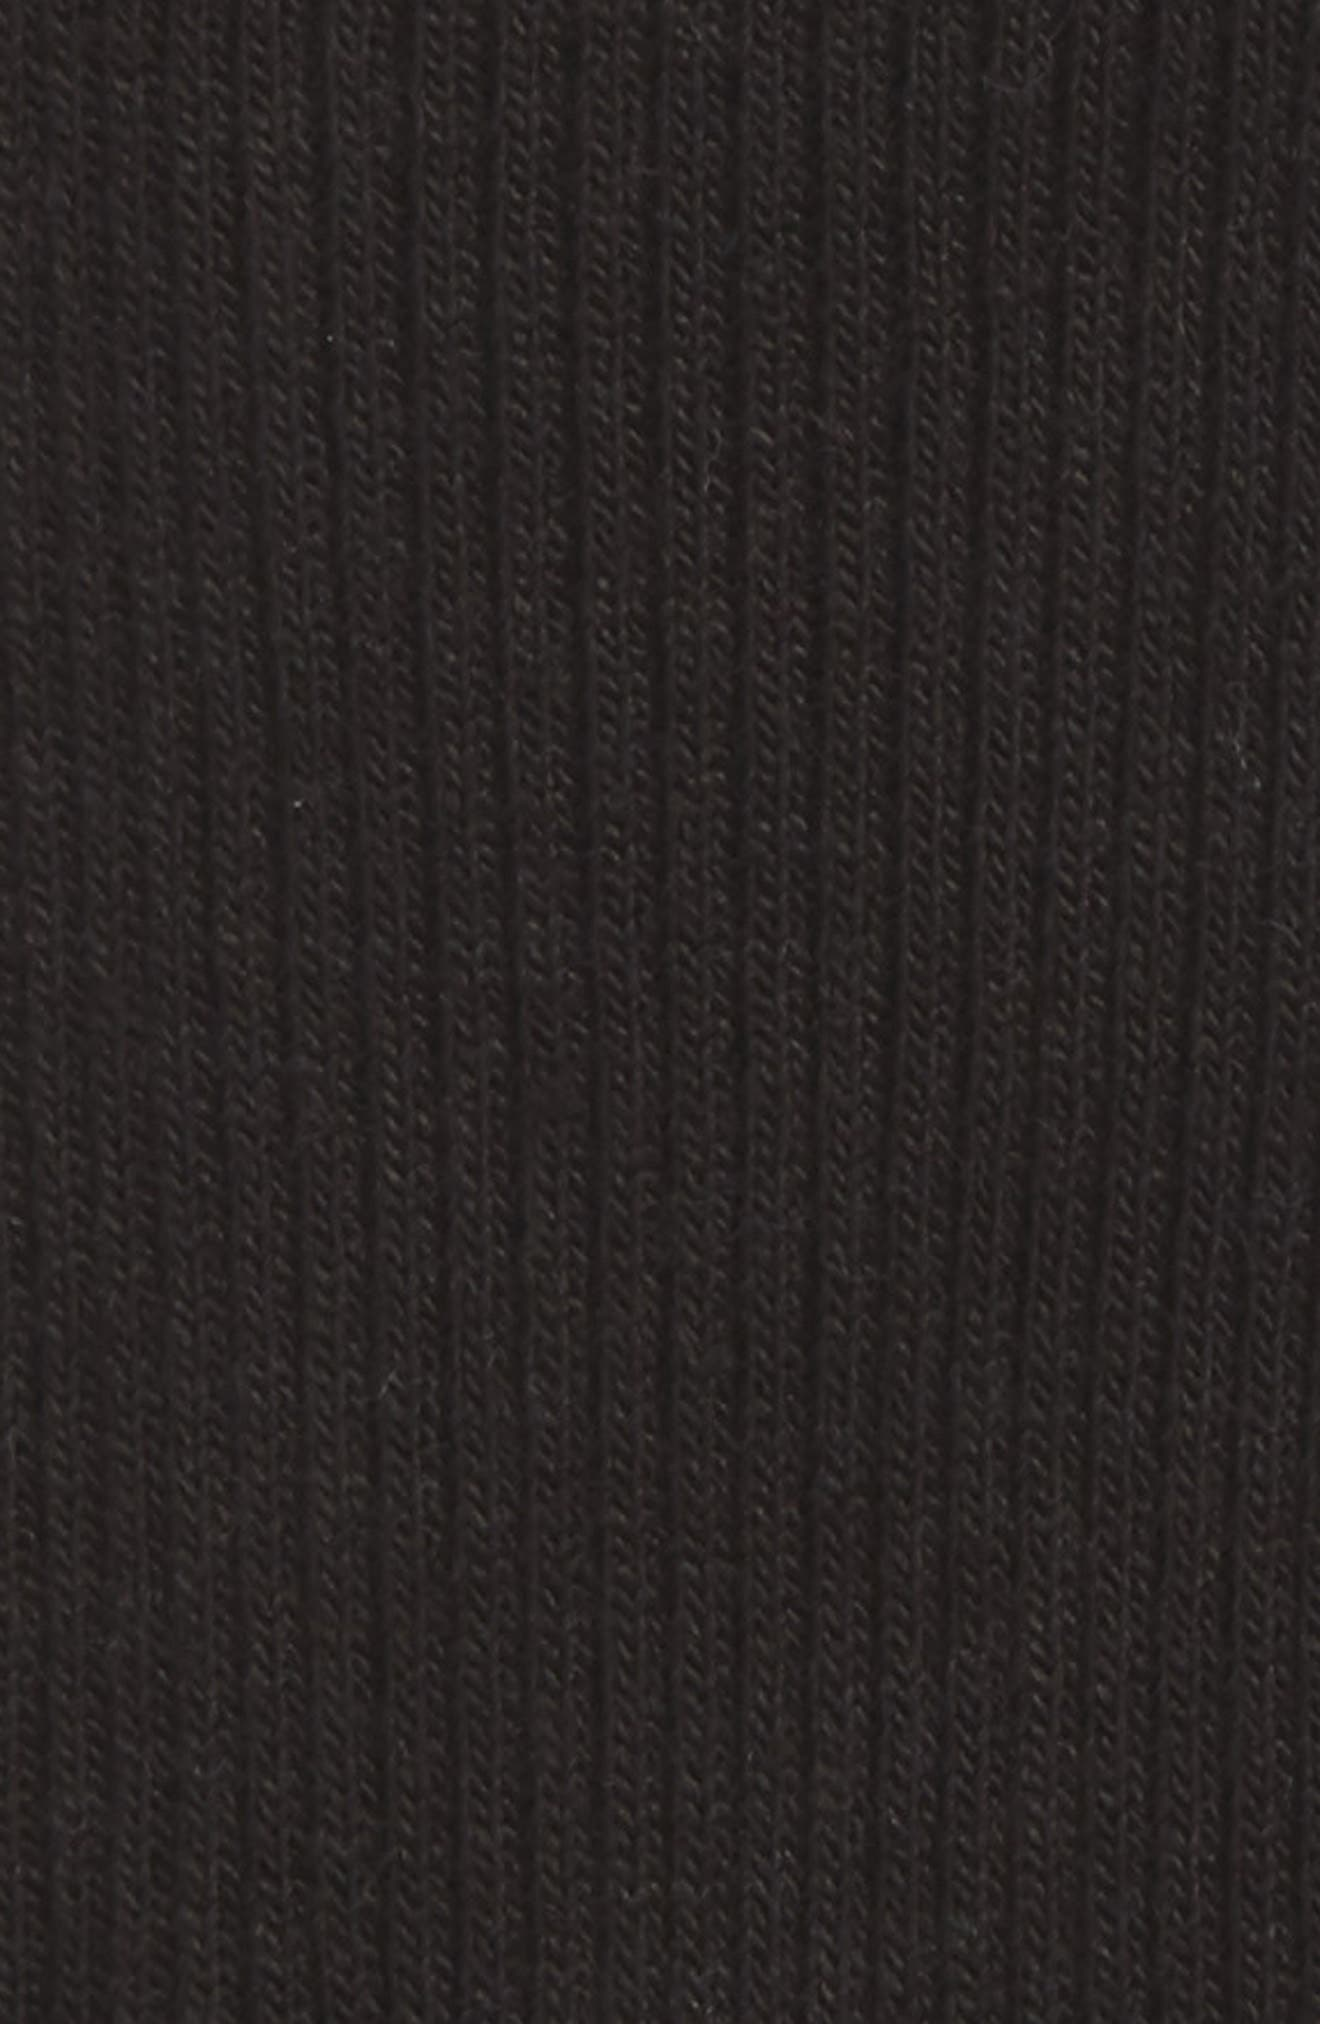 Ribbed Socks,                             Alternate thumbnail 4, color,